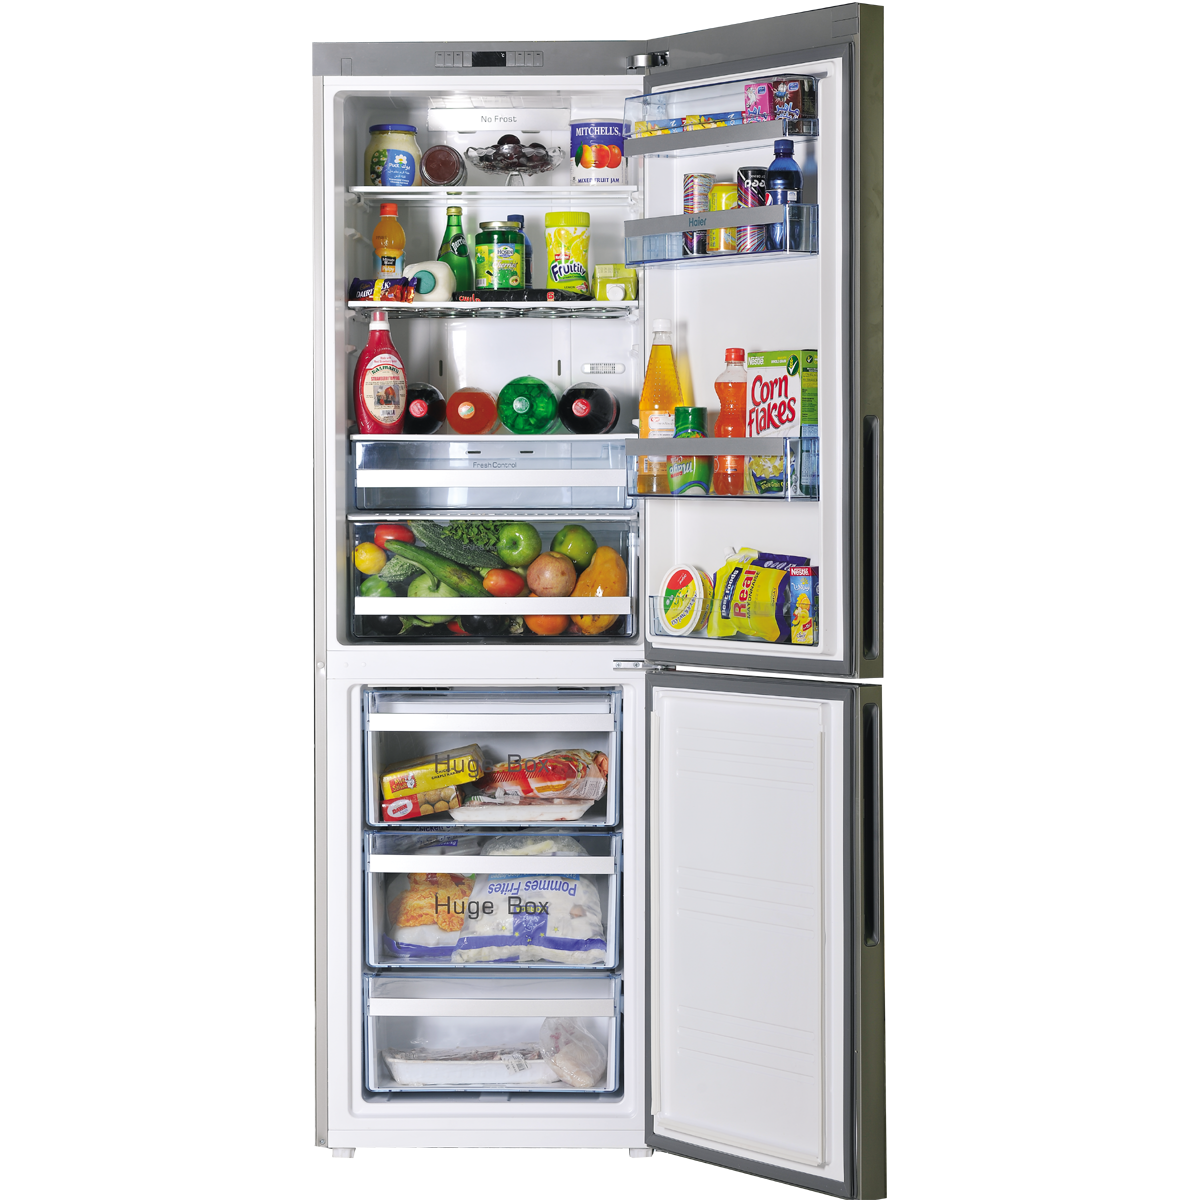 Refrigerator png transparent images. Fridge clipart mini fridge